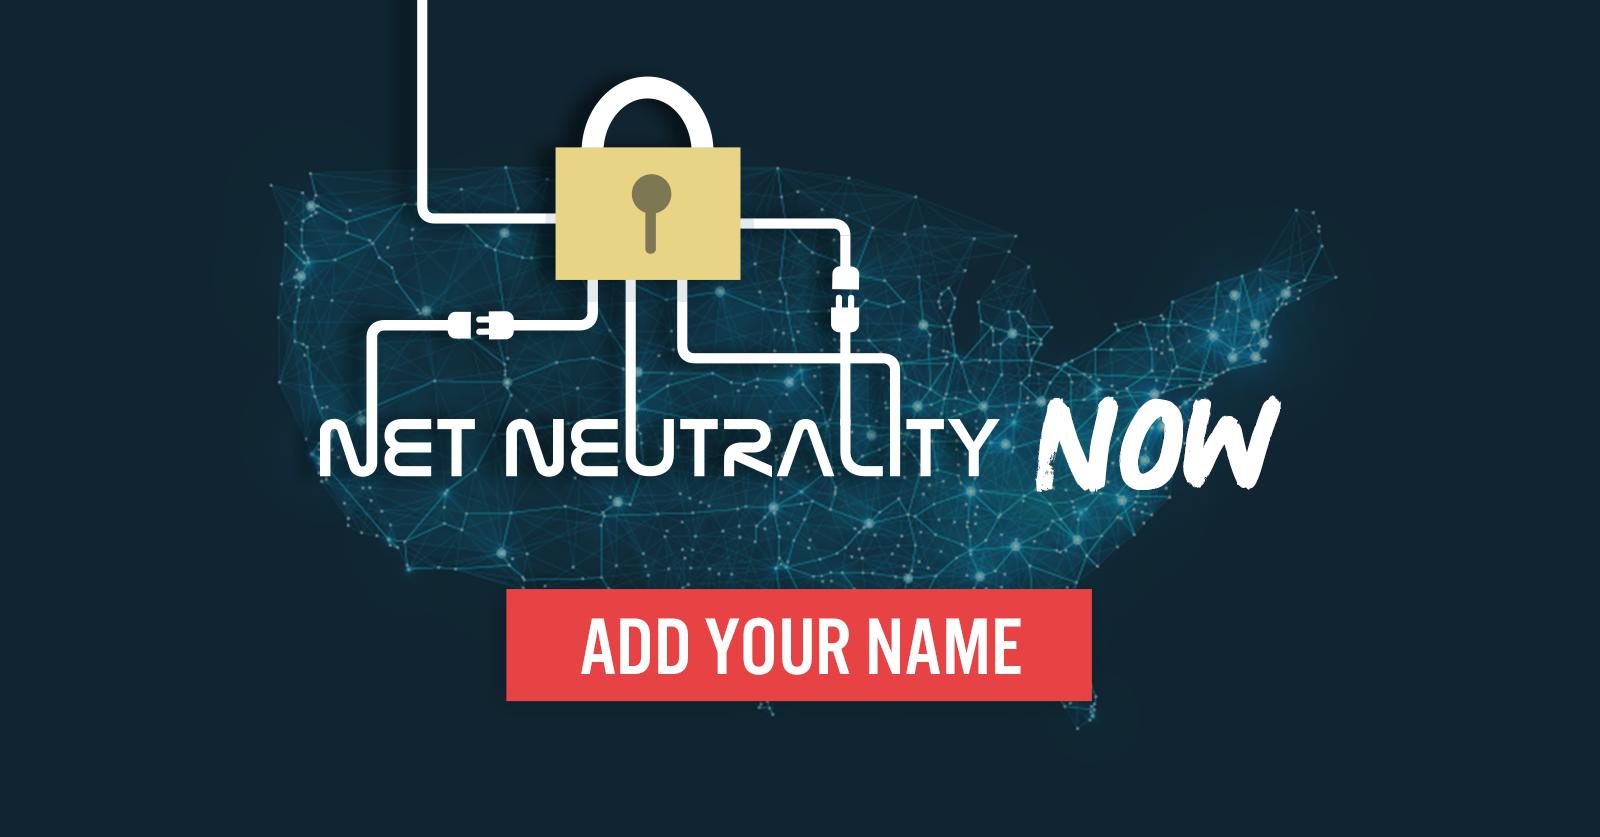 Net neutrality now!